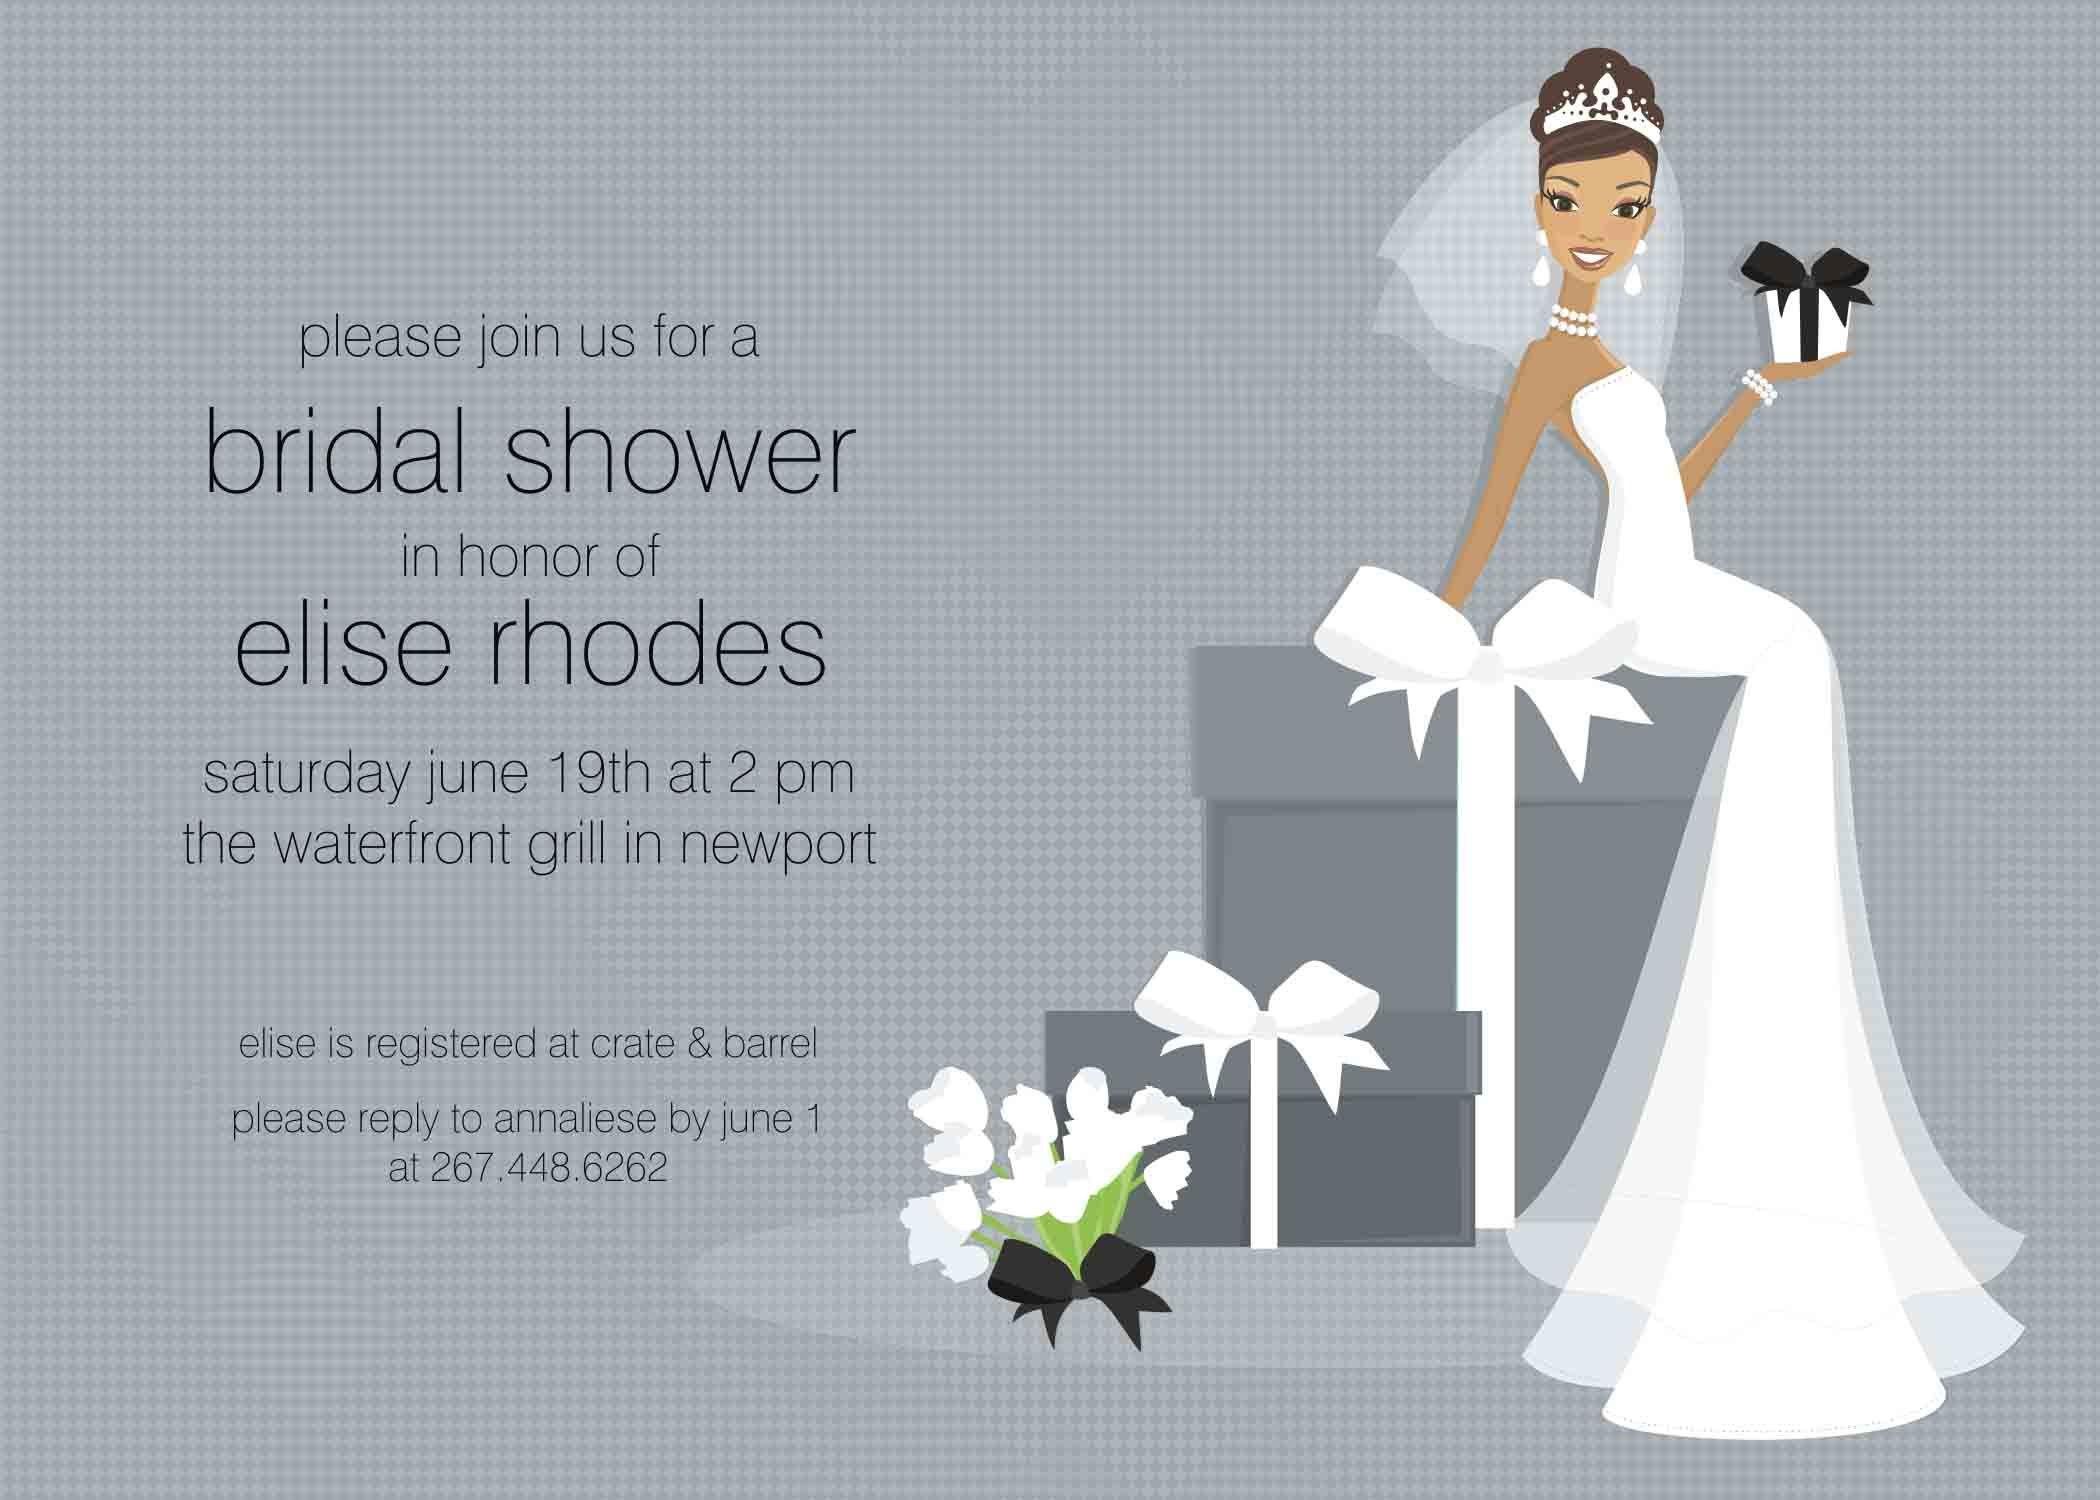 Free Bridal Shower Invitation Templates Free Bridal Shower Invitation Templates